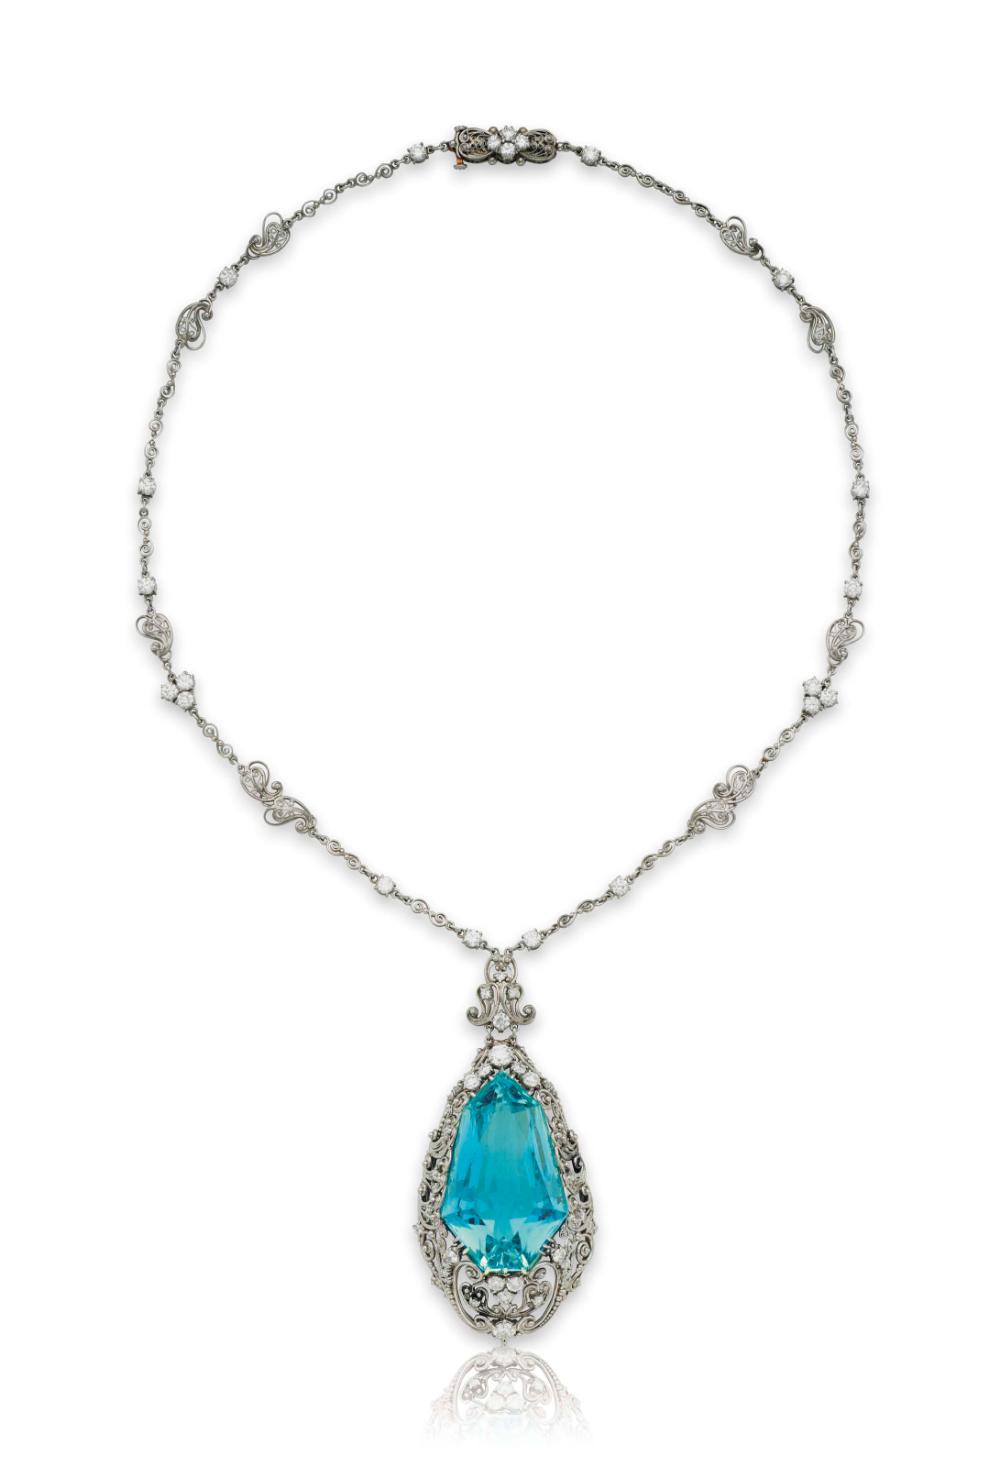 Aquamarine And Diamond Pendant Necklace By Louis Comfort Tiffany Diamond Jewelry Necklace Diamond Pendant Beautiful Jewelry